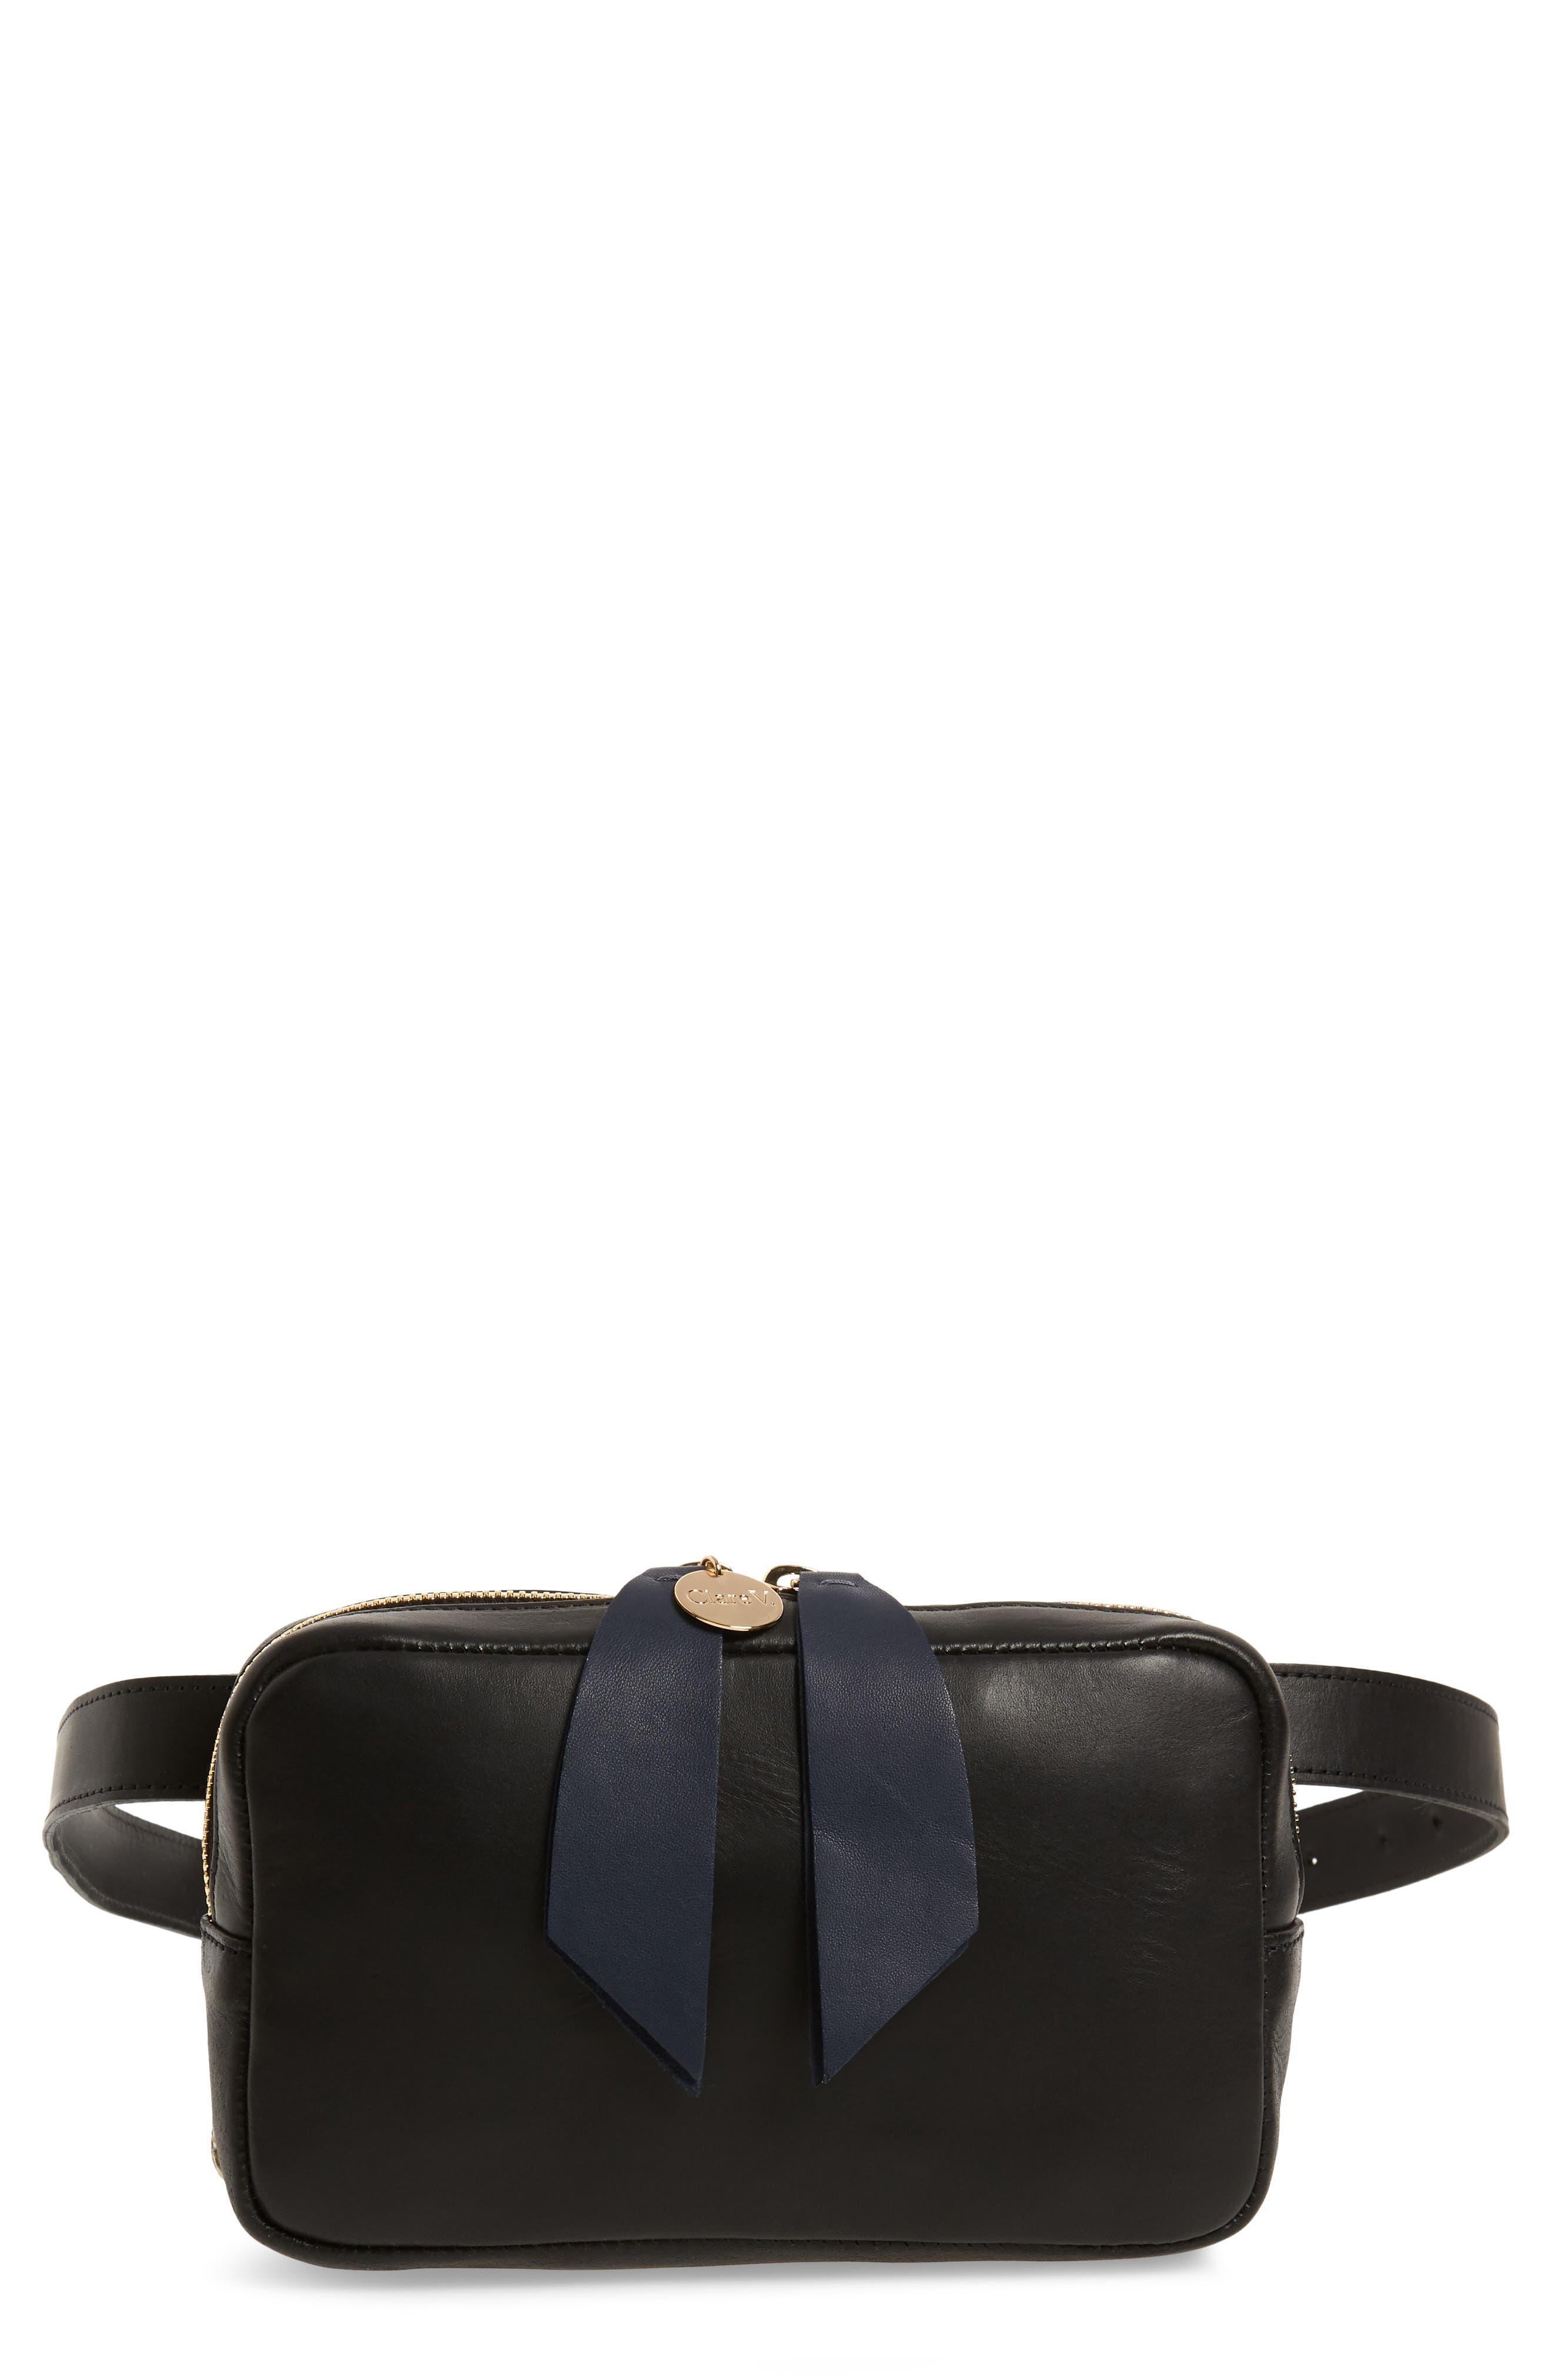 Le Belt Leather Convertible Crossbody Bag,                             Main thumbnail 1, color,                             BLACK VEGAN